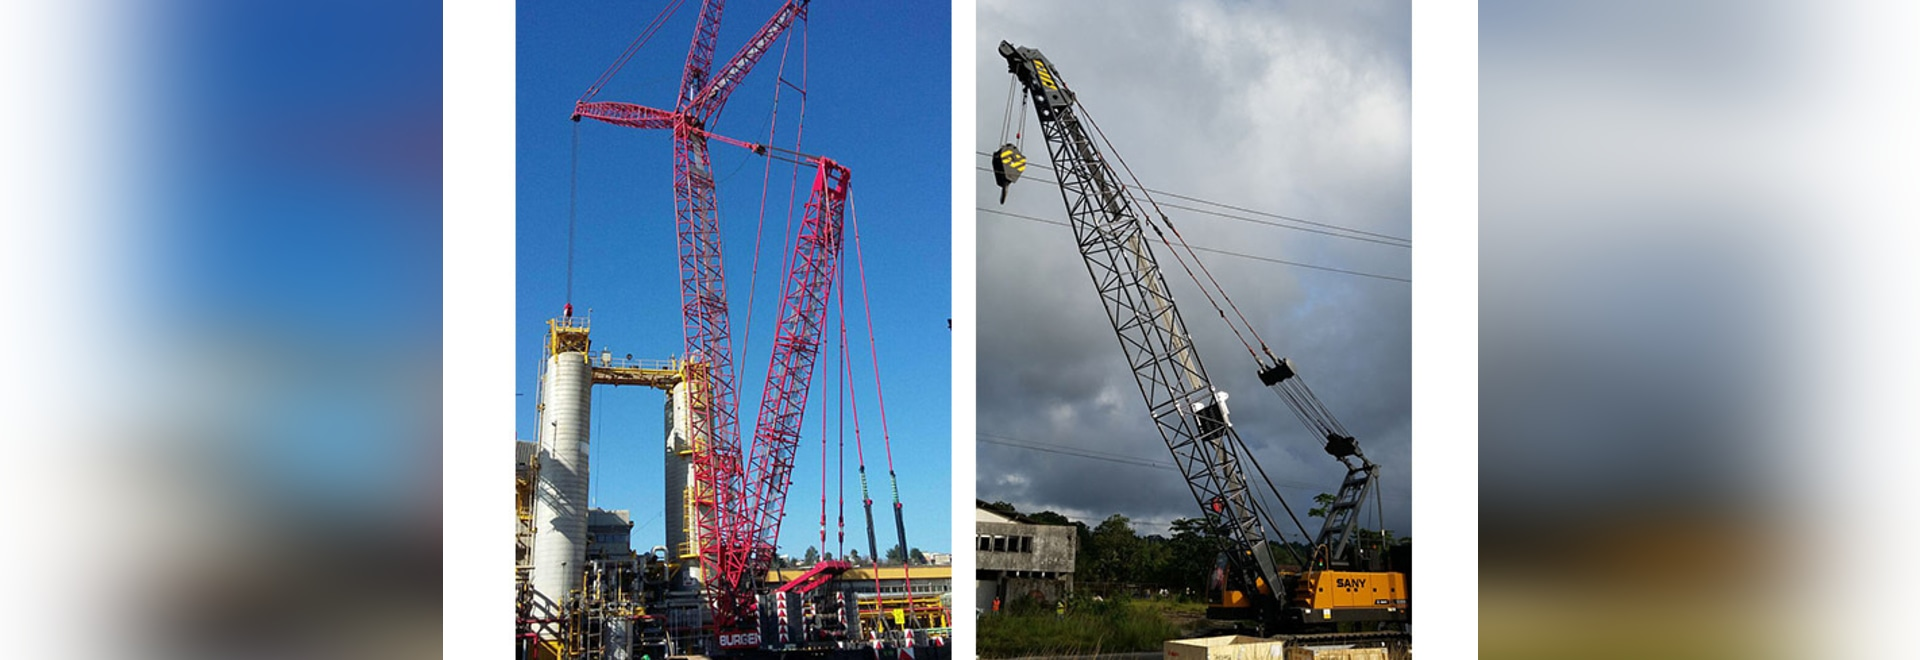 SANY crawler crane participates in Latin America infrastructure construction